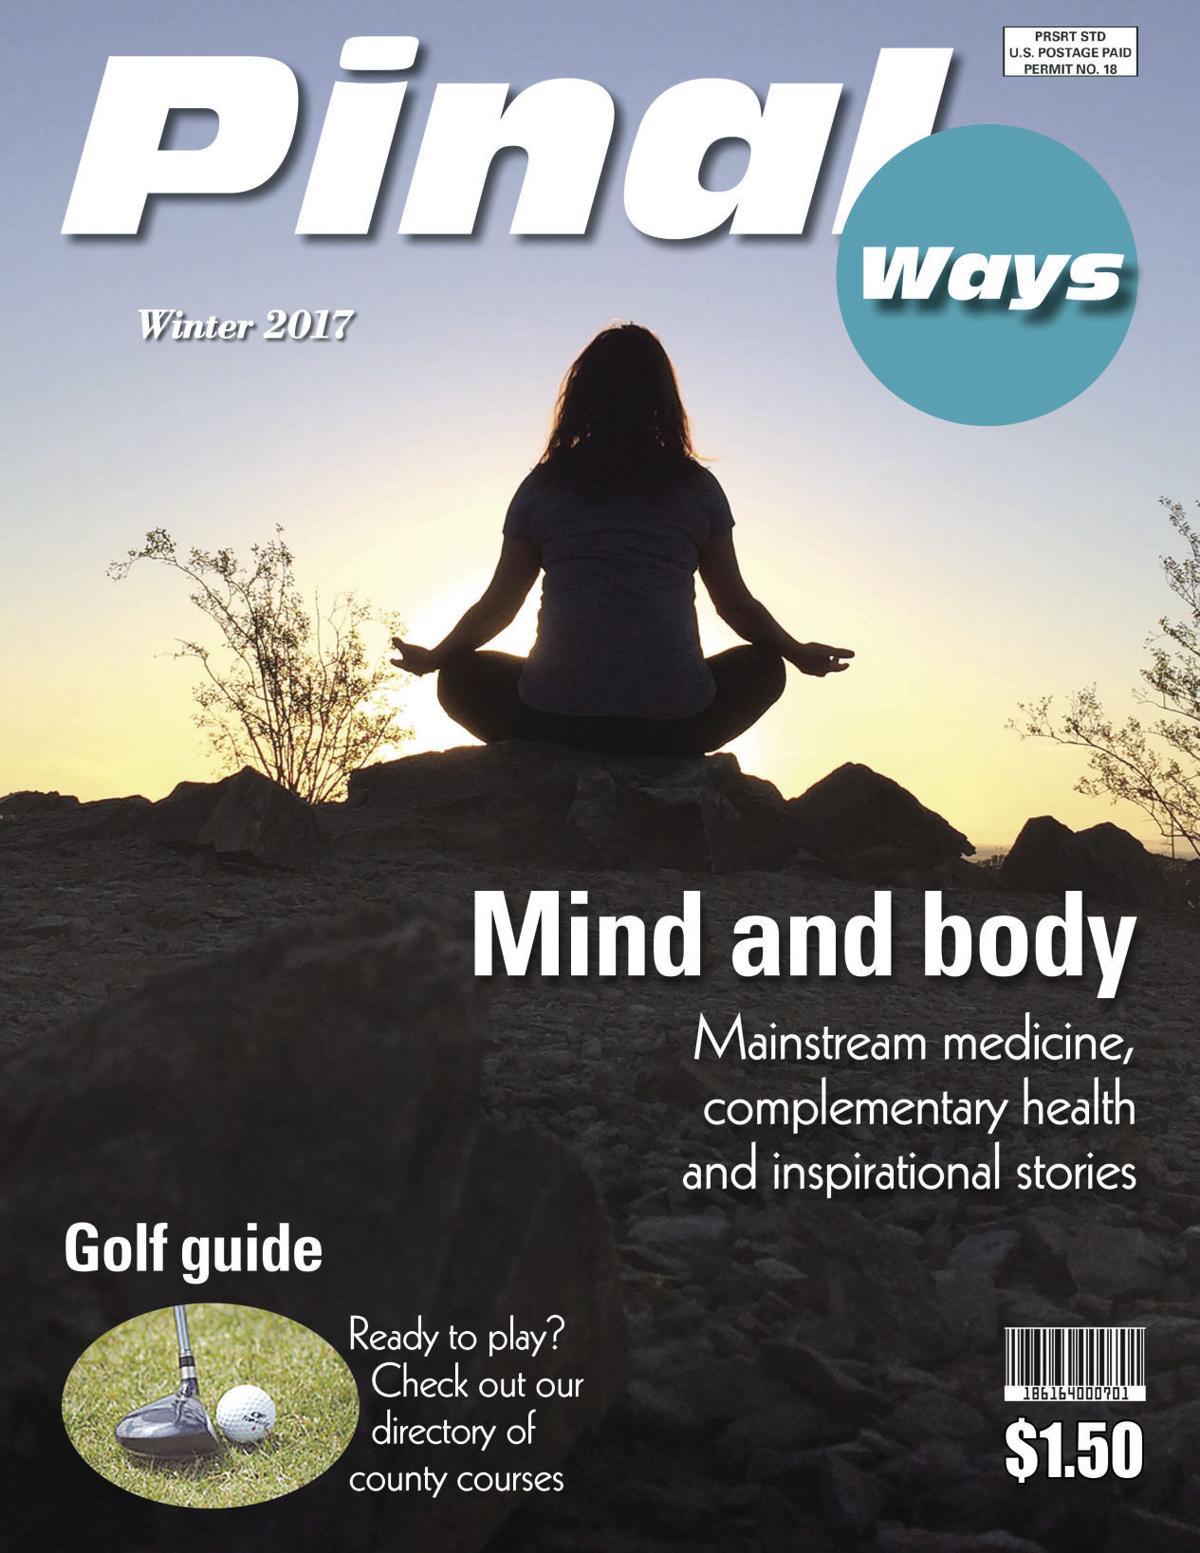 Winter 2017 Pinal Ways magazine cover